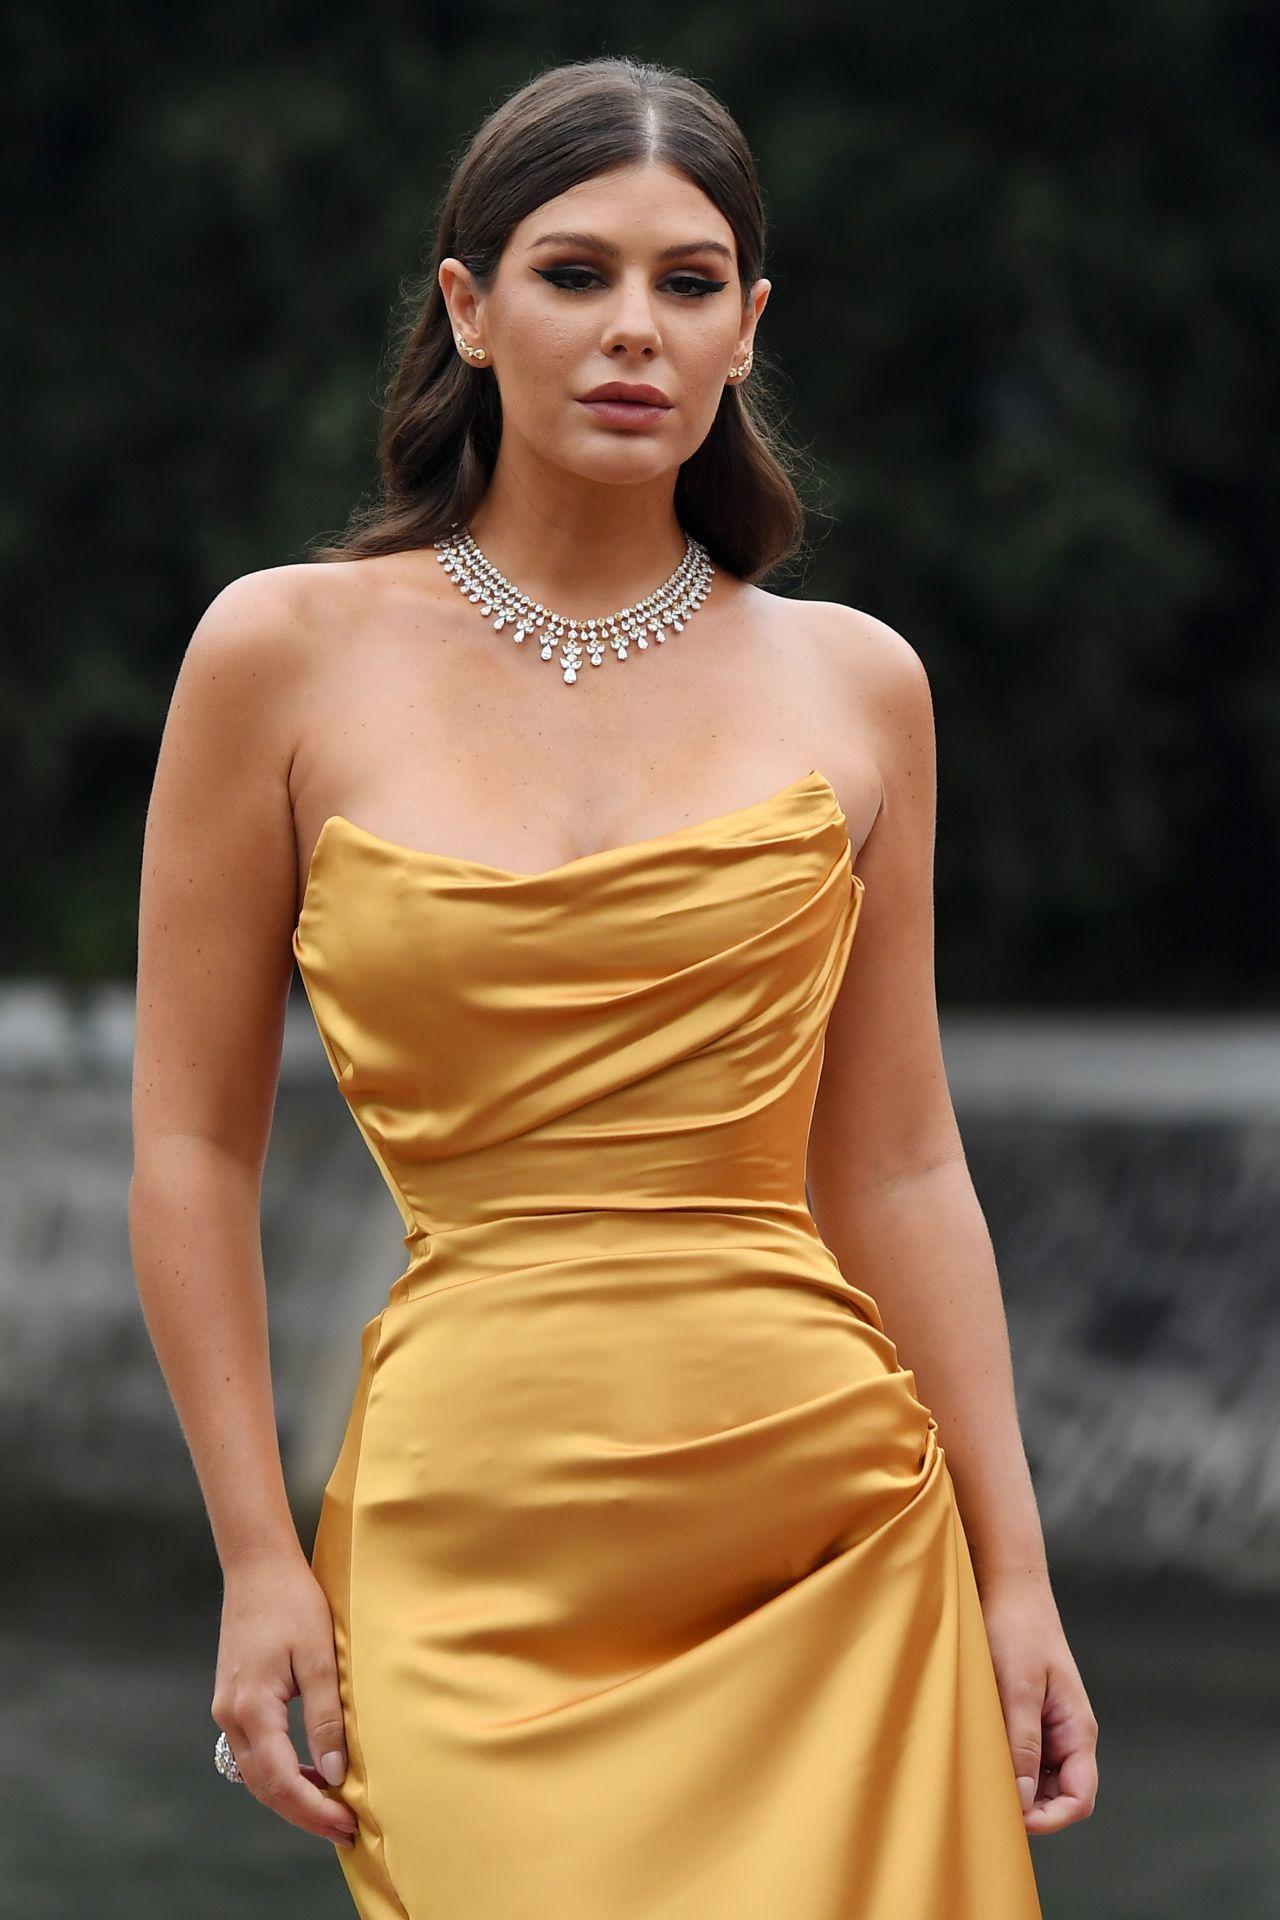 ICloud Nima Benati nudes (57 photos), Pussy, Hot, Boobs, legs 2019